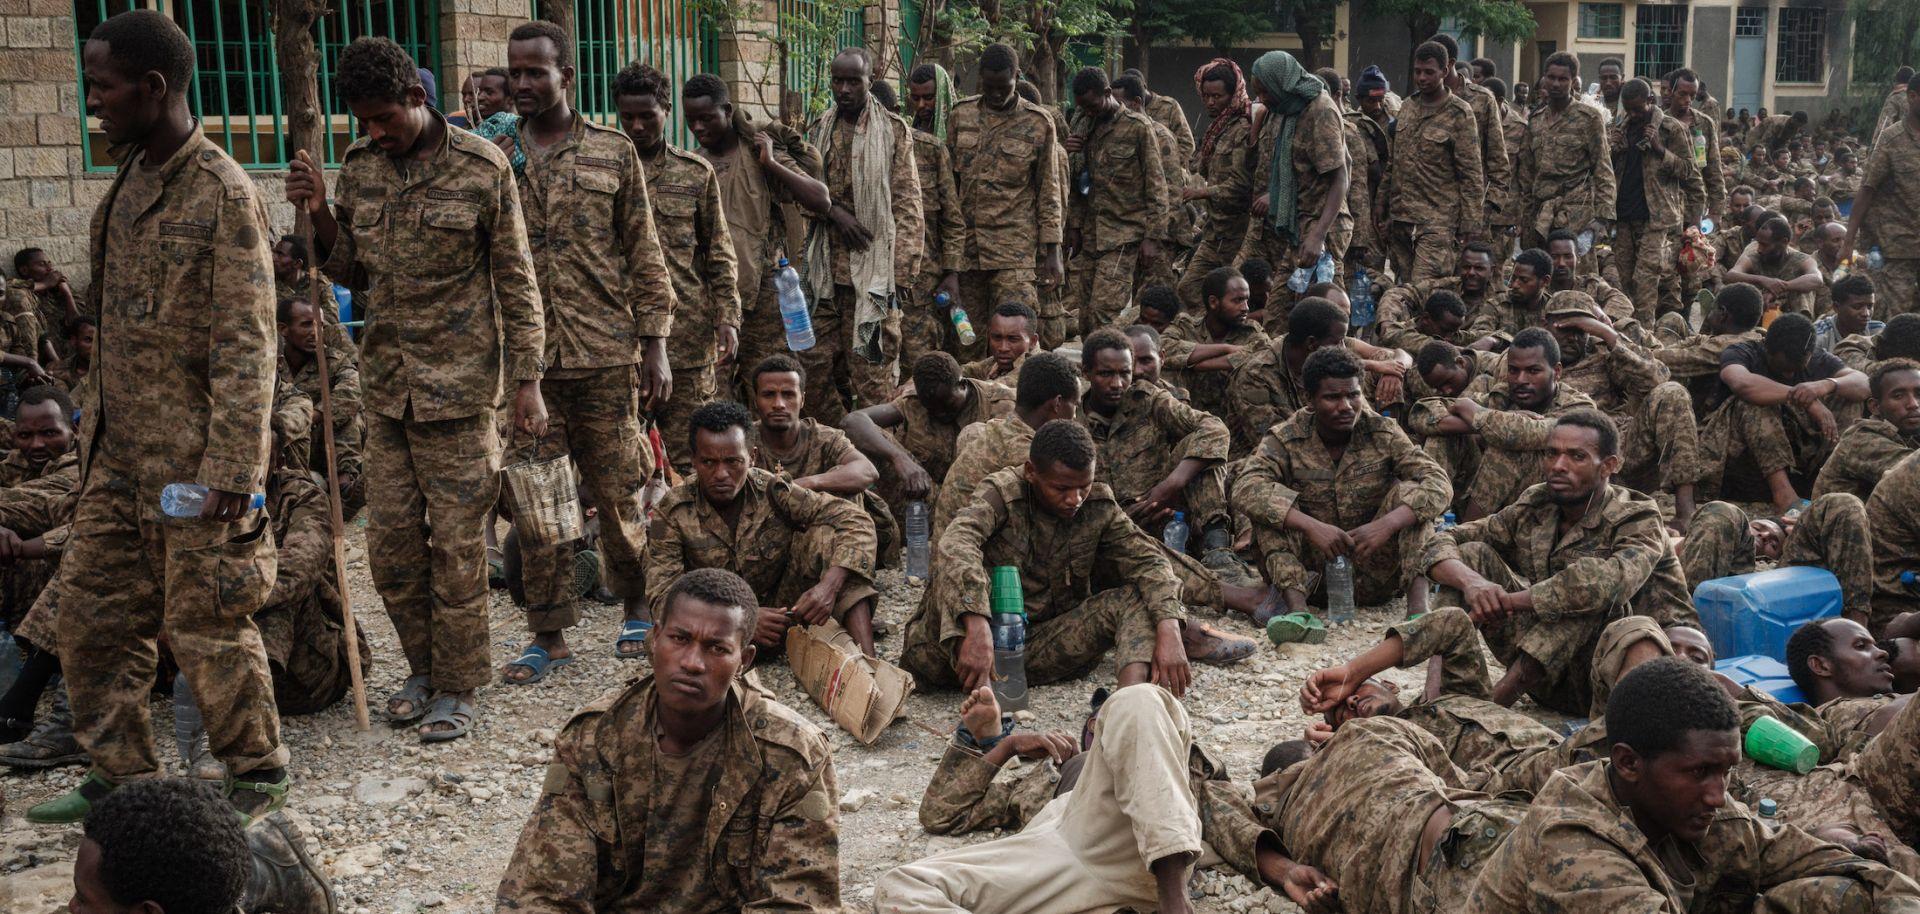 Captive Ethiopian soldiers arrive in Tigray's regional capital of Mekele on July 2, 2021.